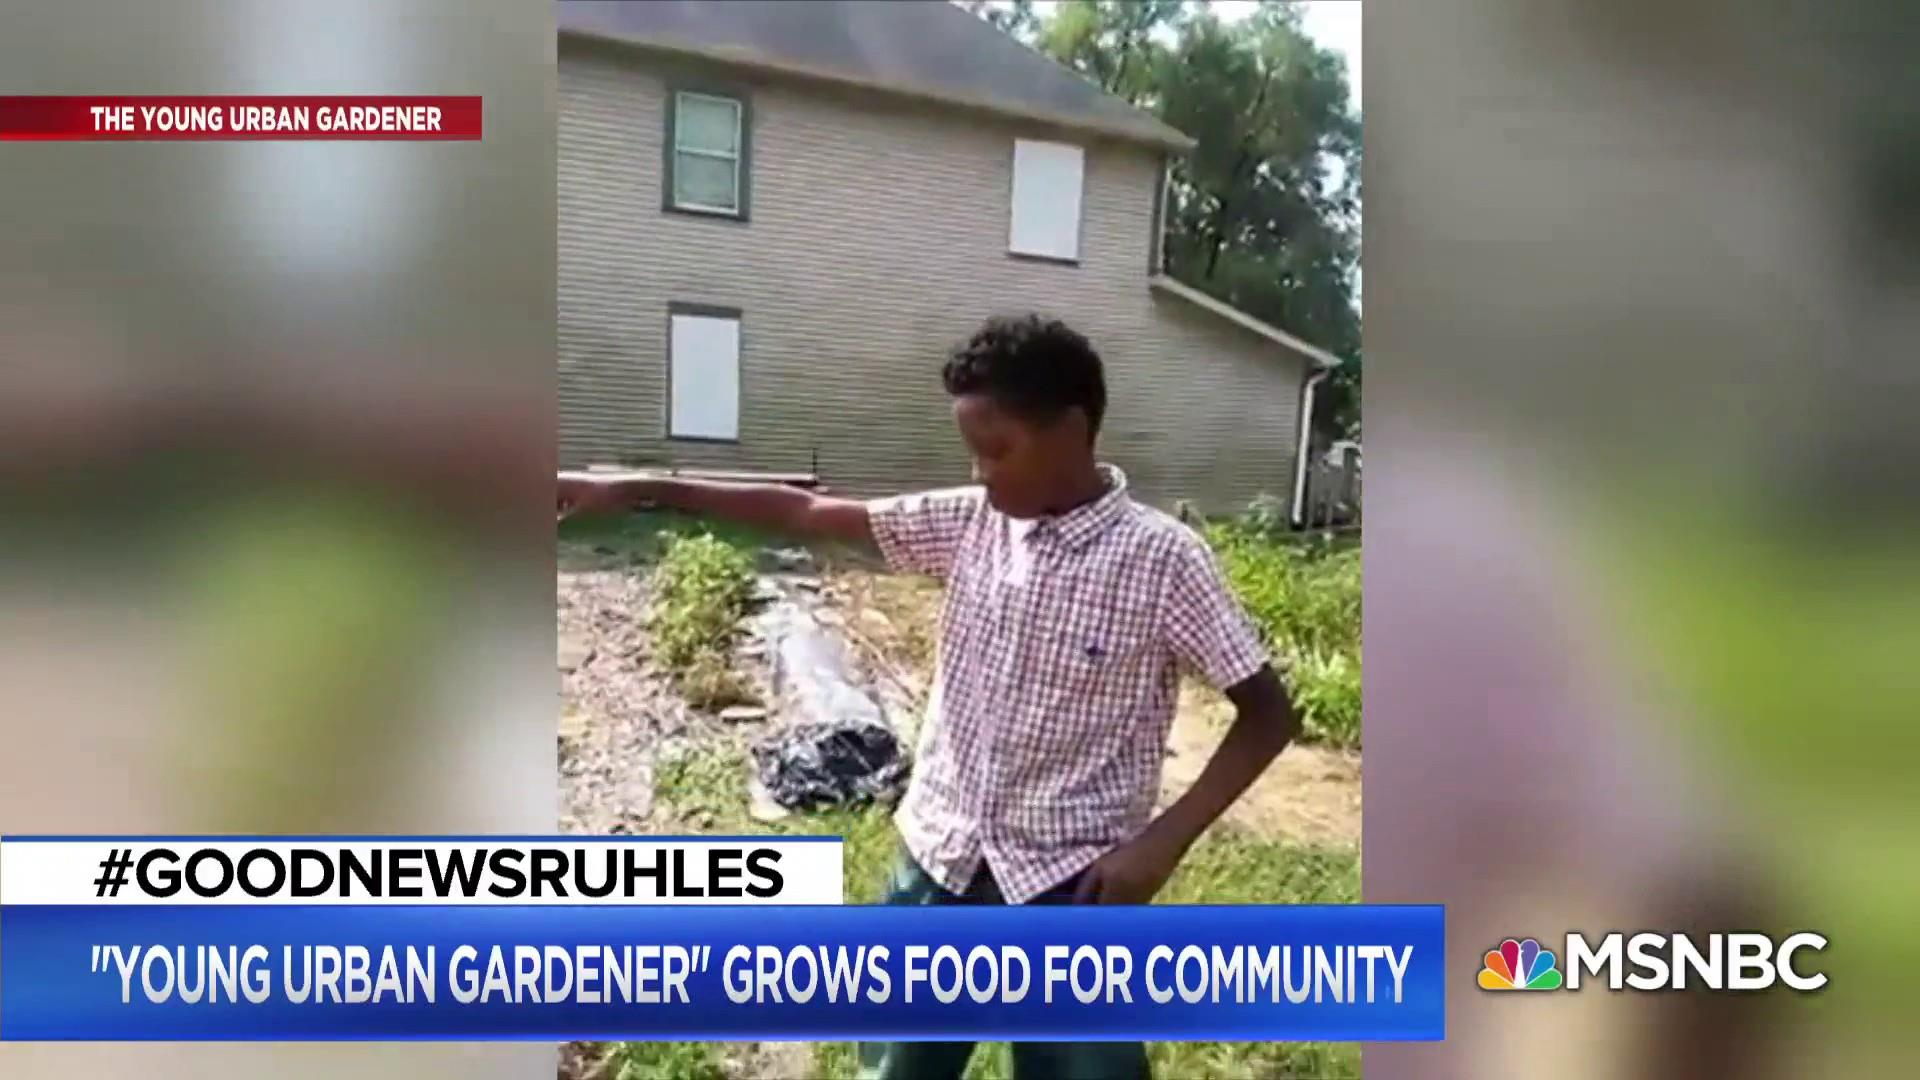 #GoodNewsRUHLES: The Young Urban Gardener